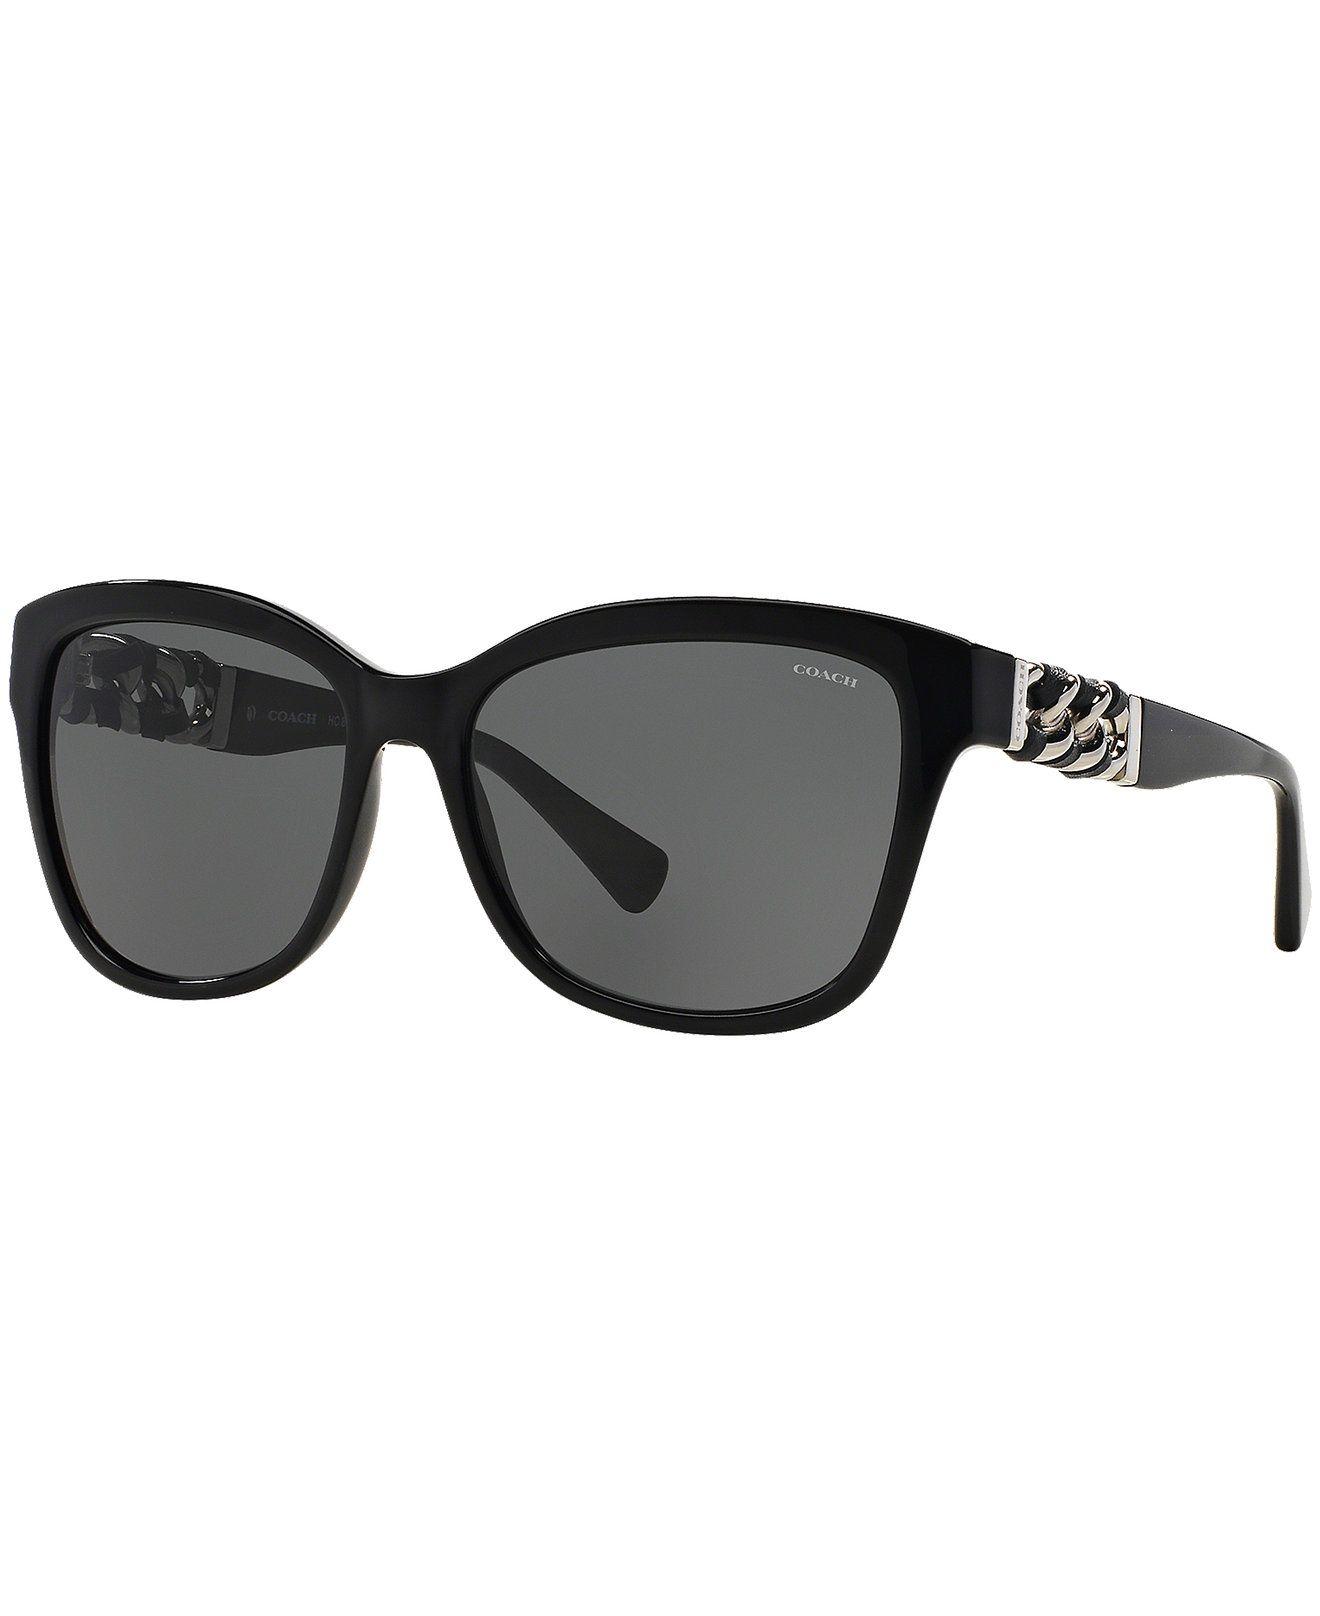 9d8a07048cea Coach Sunglasses, COACH HC8156Q 56 L131 - Sunglasses for Round Faces -  Handbags & Accessories - Macy's